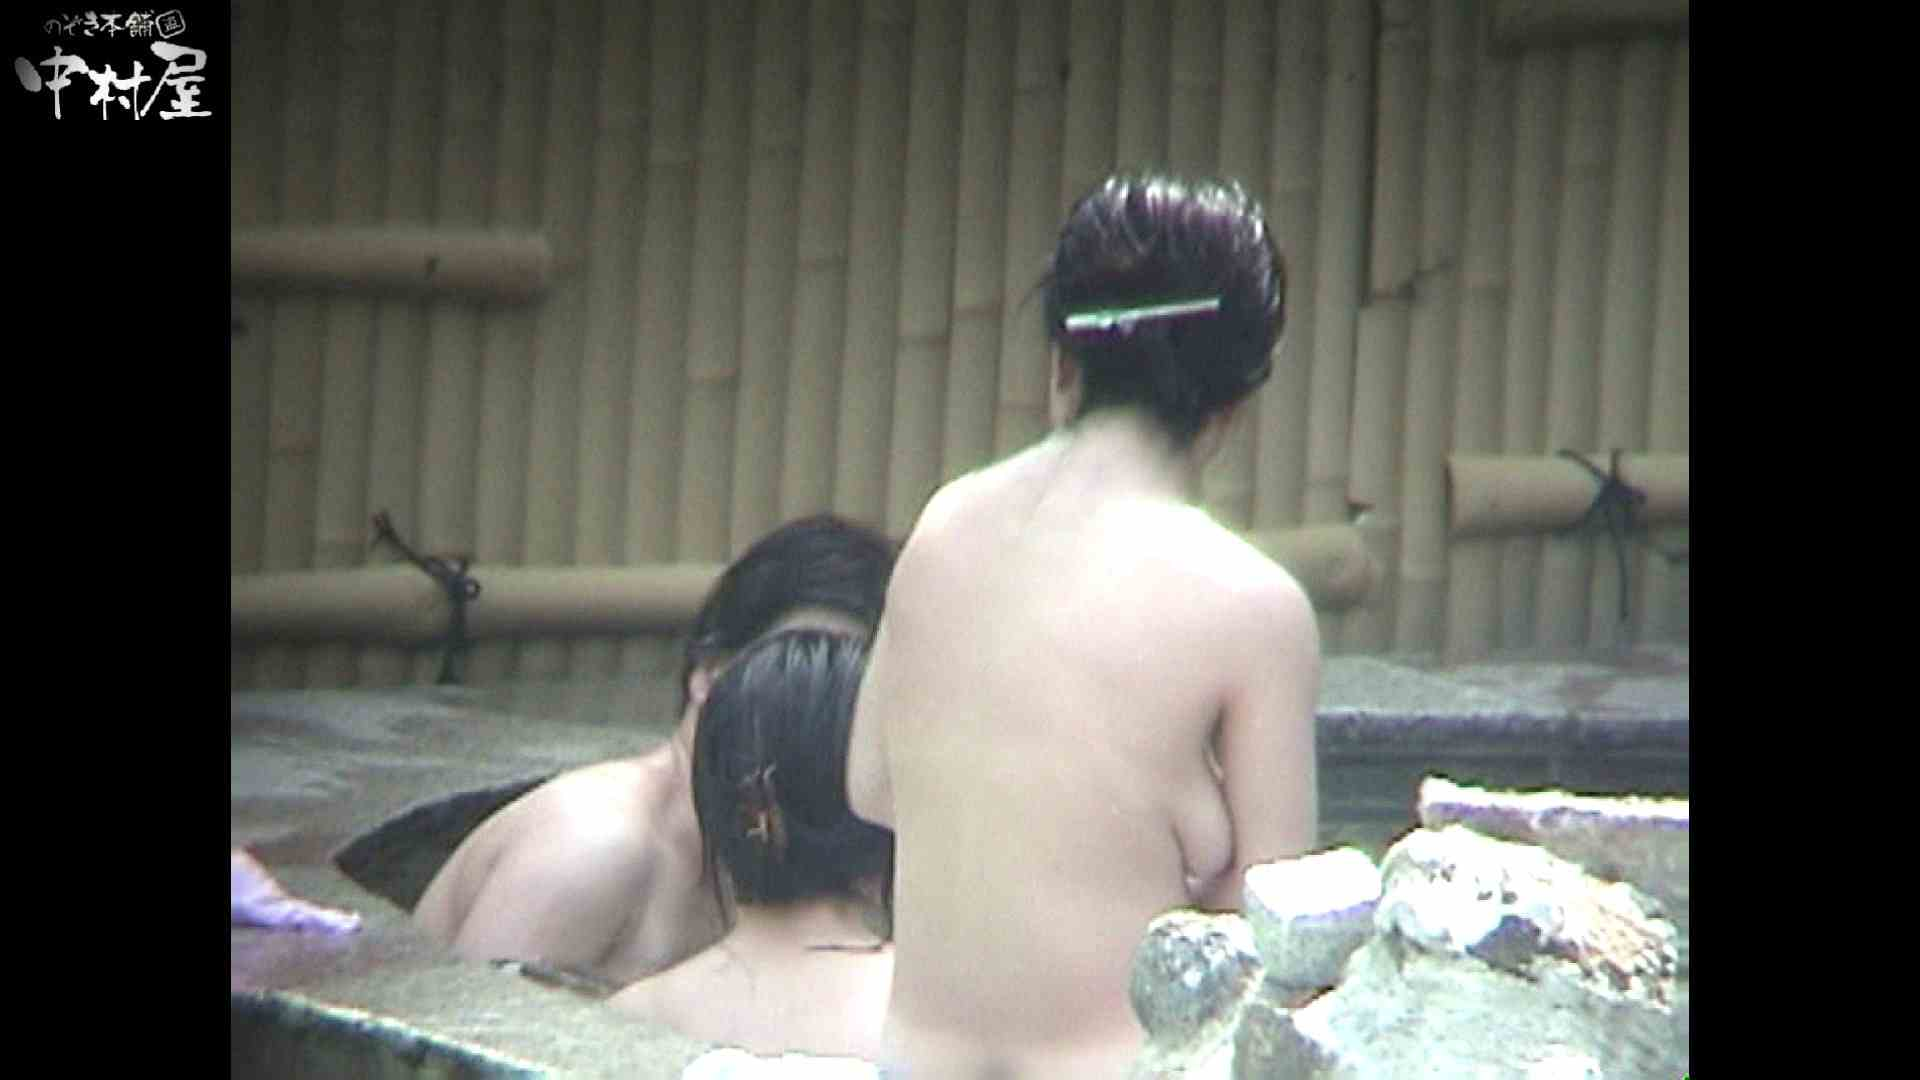 Aquaな露天風呂Vol.936 盗撮映像  110Pix 98